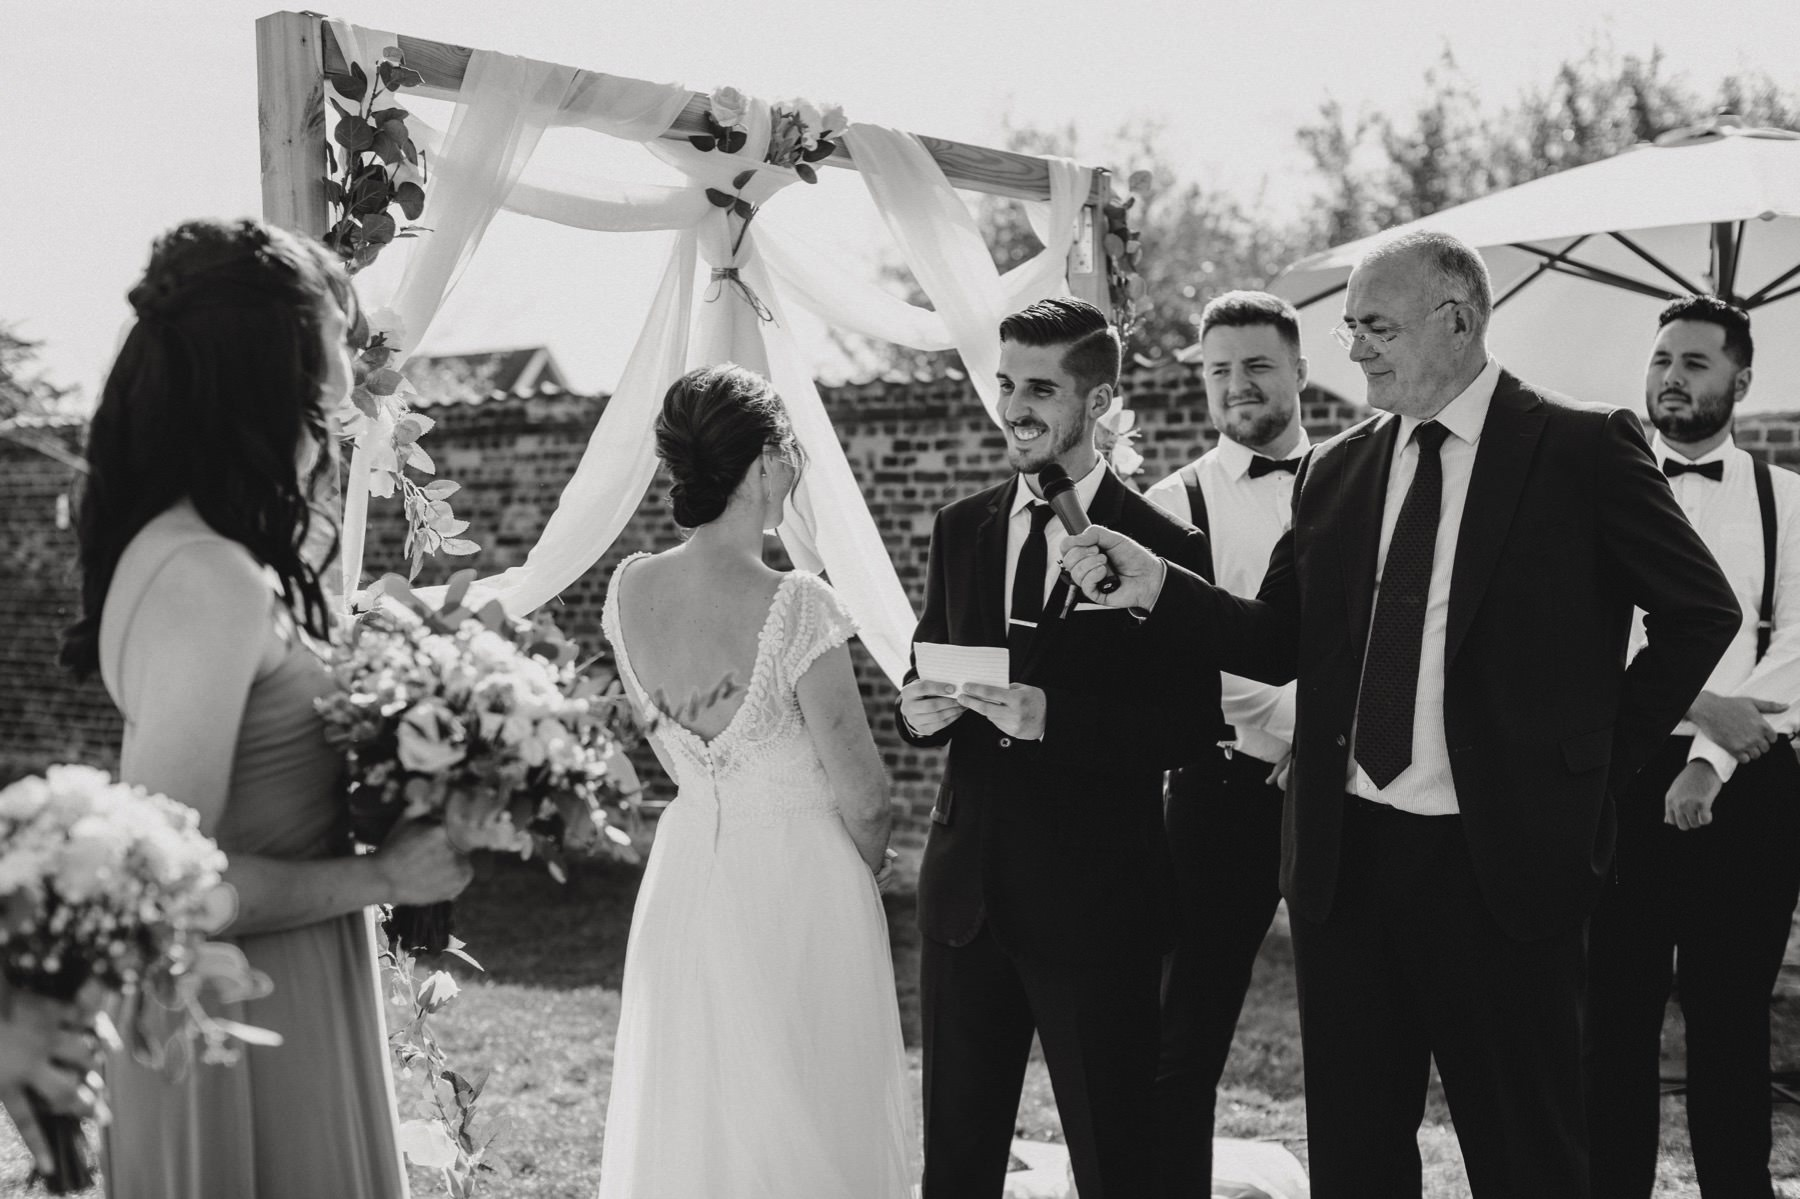 Christian wedding in Belgium